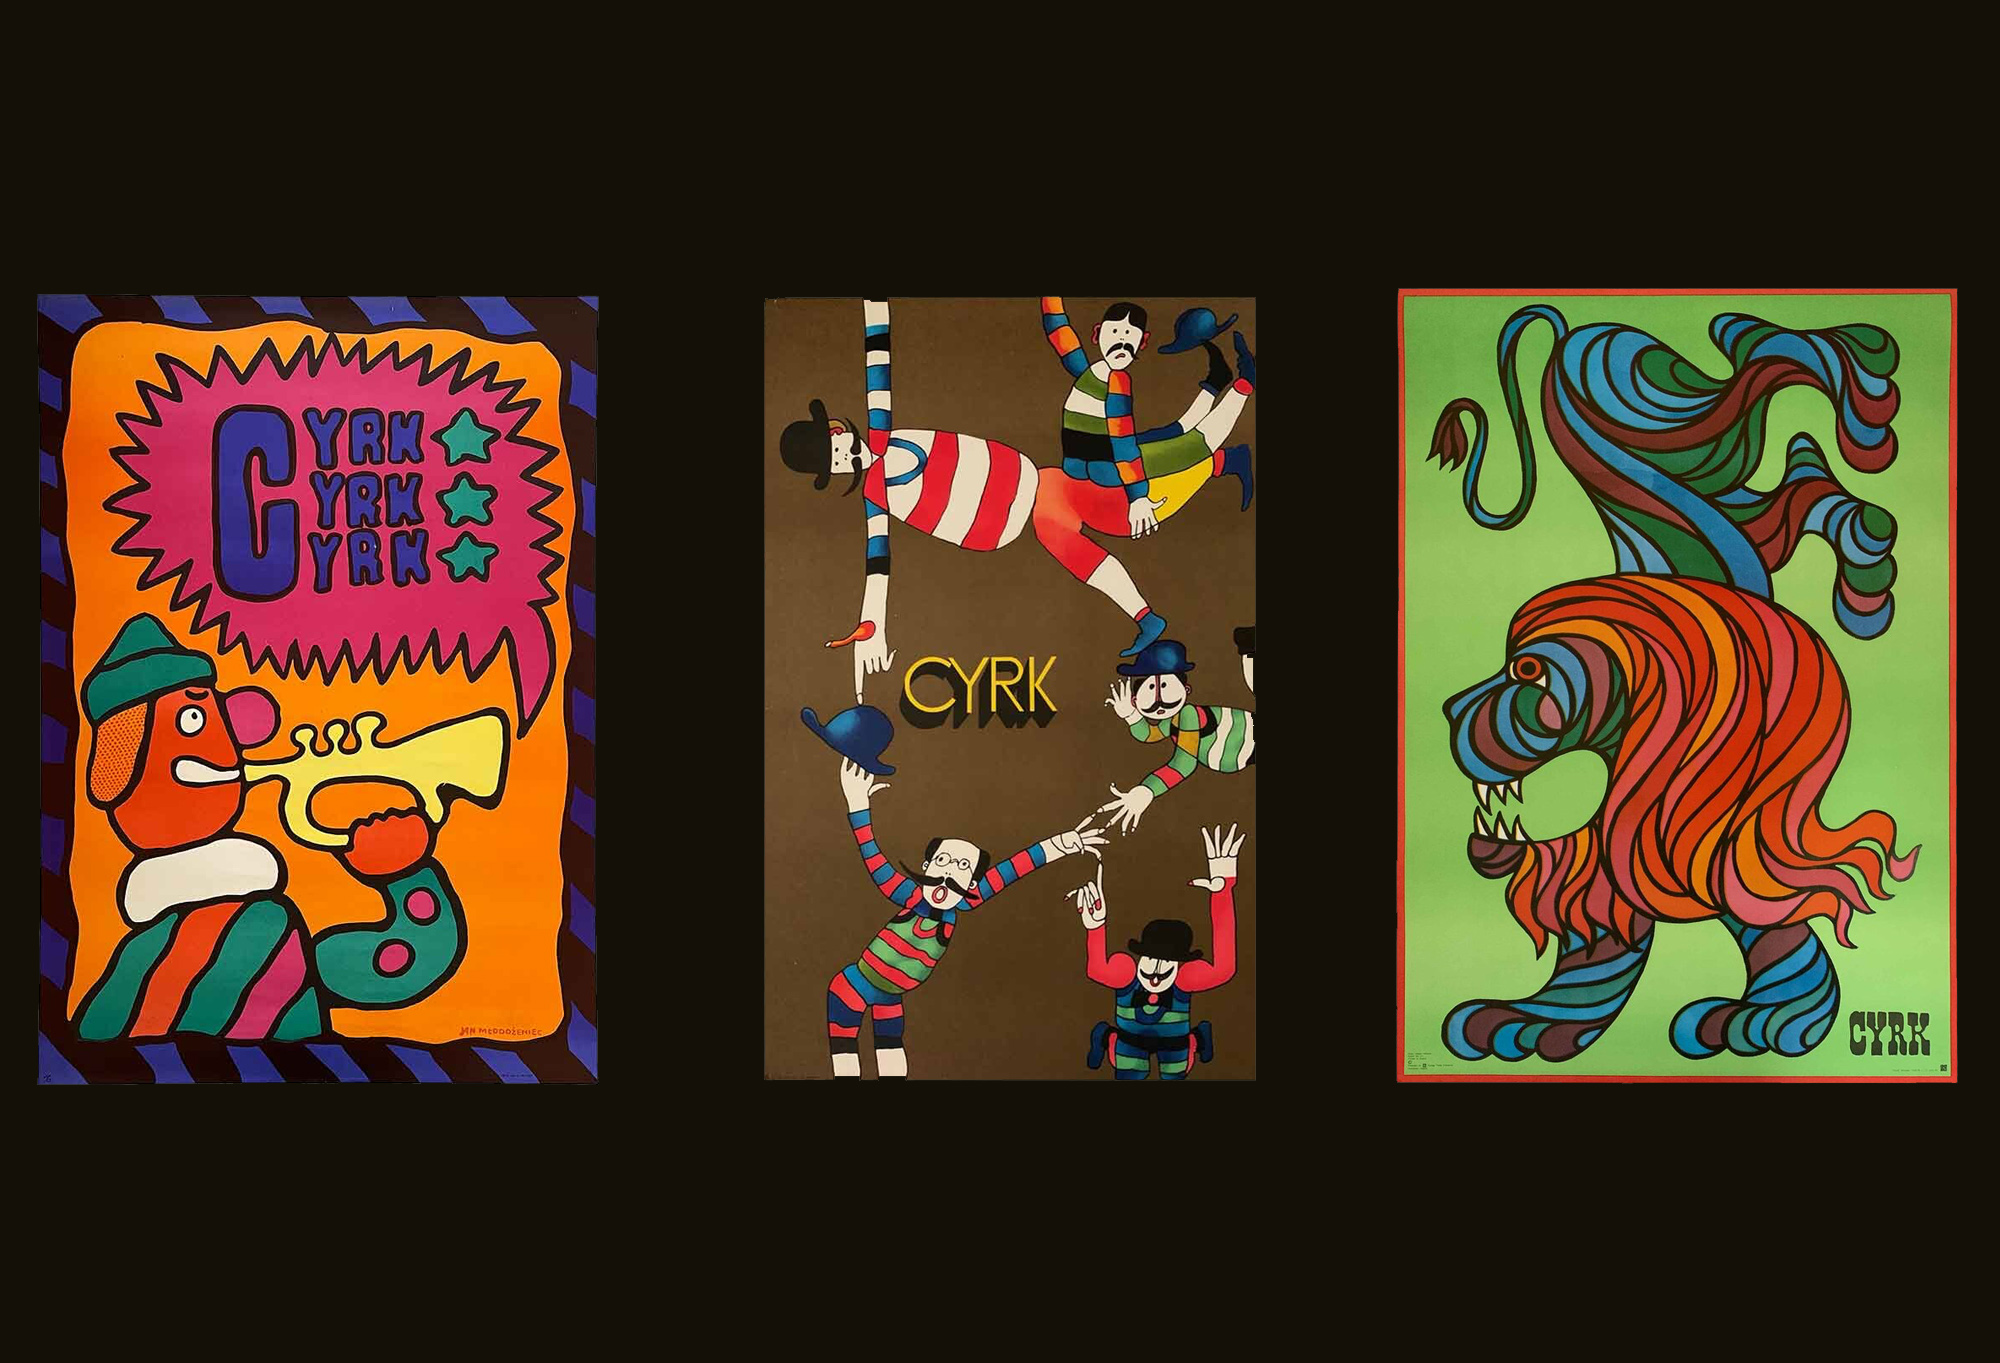 Polish cyrk (circus) posters